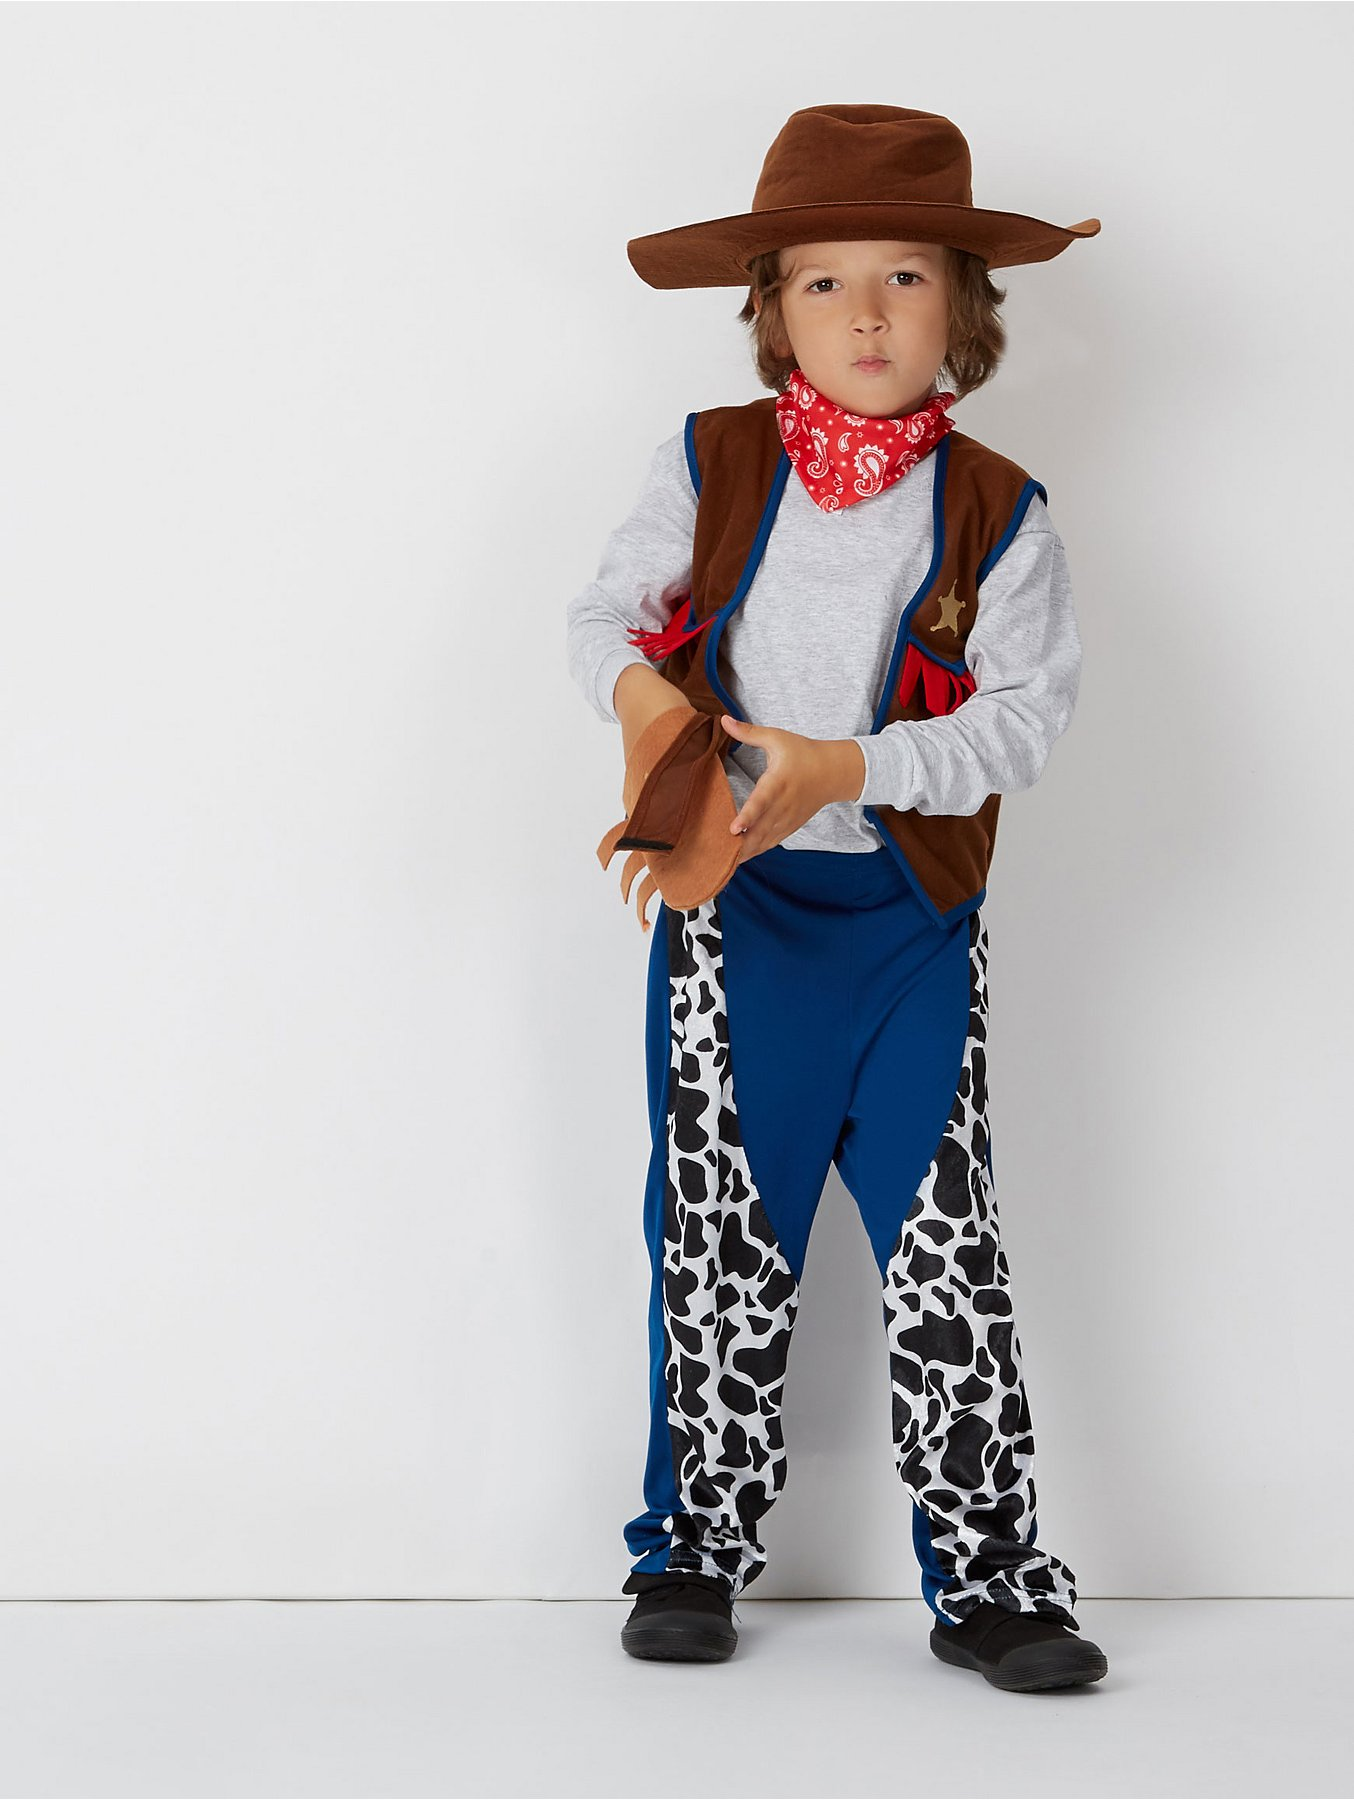 7f7be881186 Cowboy Fancy Dress Costume